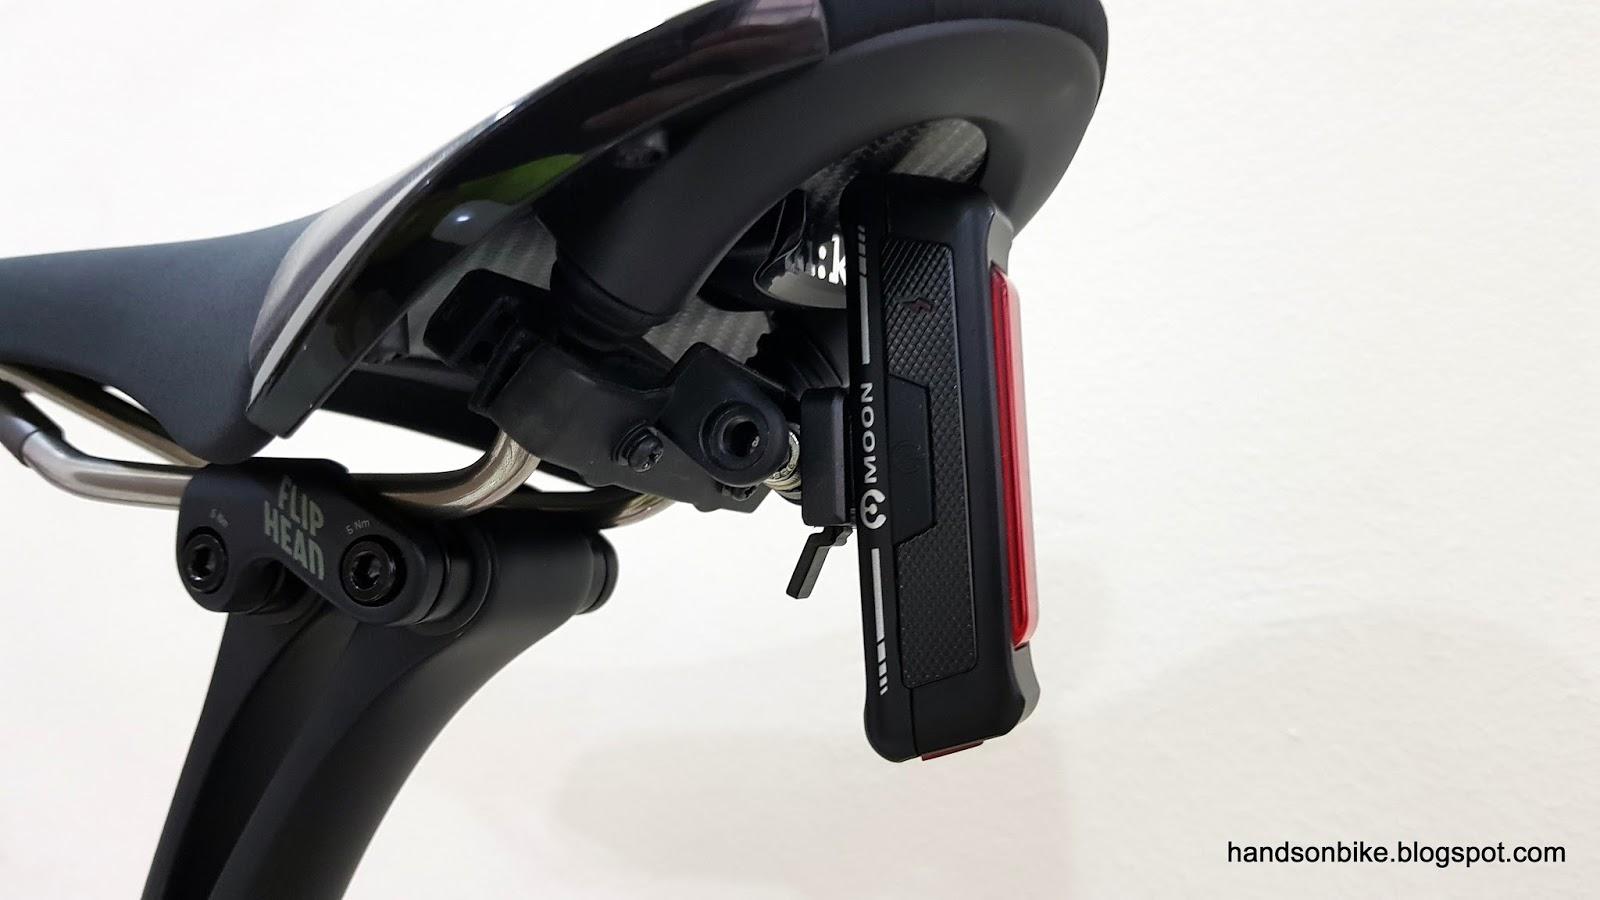 b0f19005013 CatEye CA5446510 RM-1 Rear Saddle Mount Bracket Cycling Lights and  Reflectors